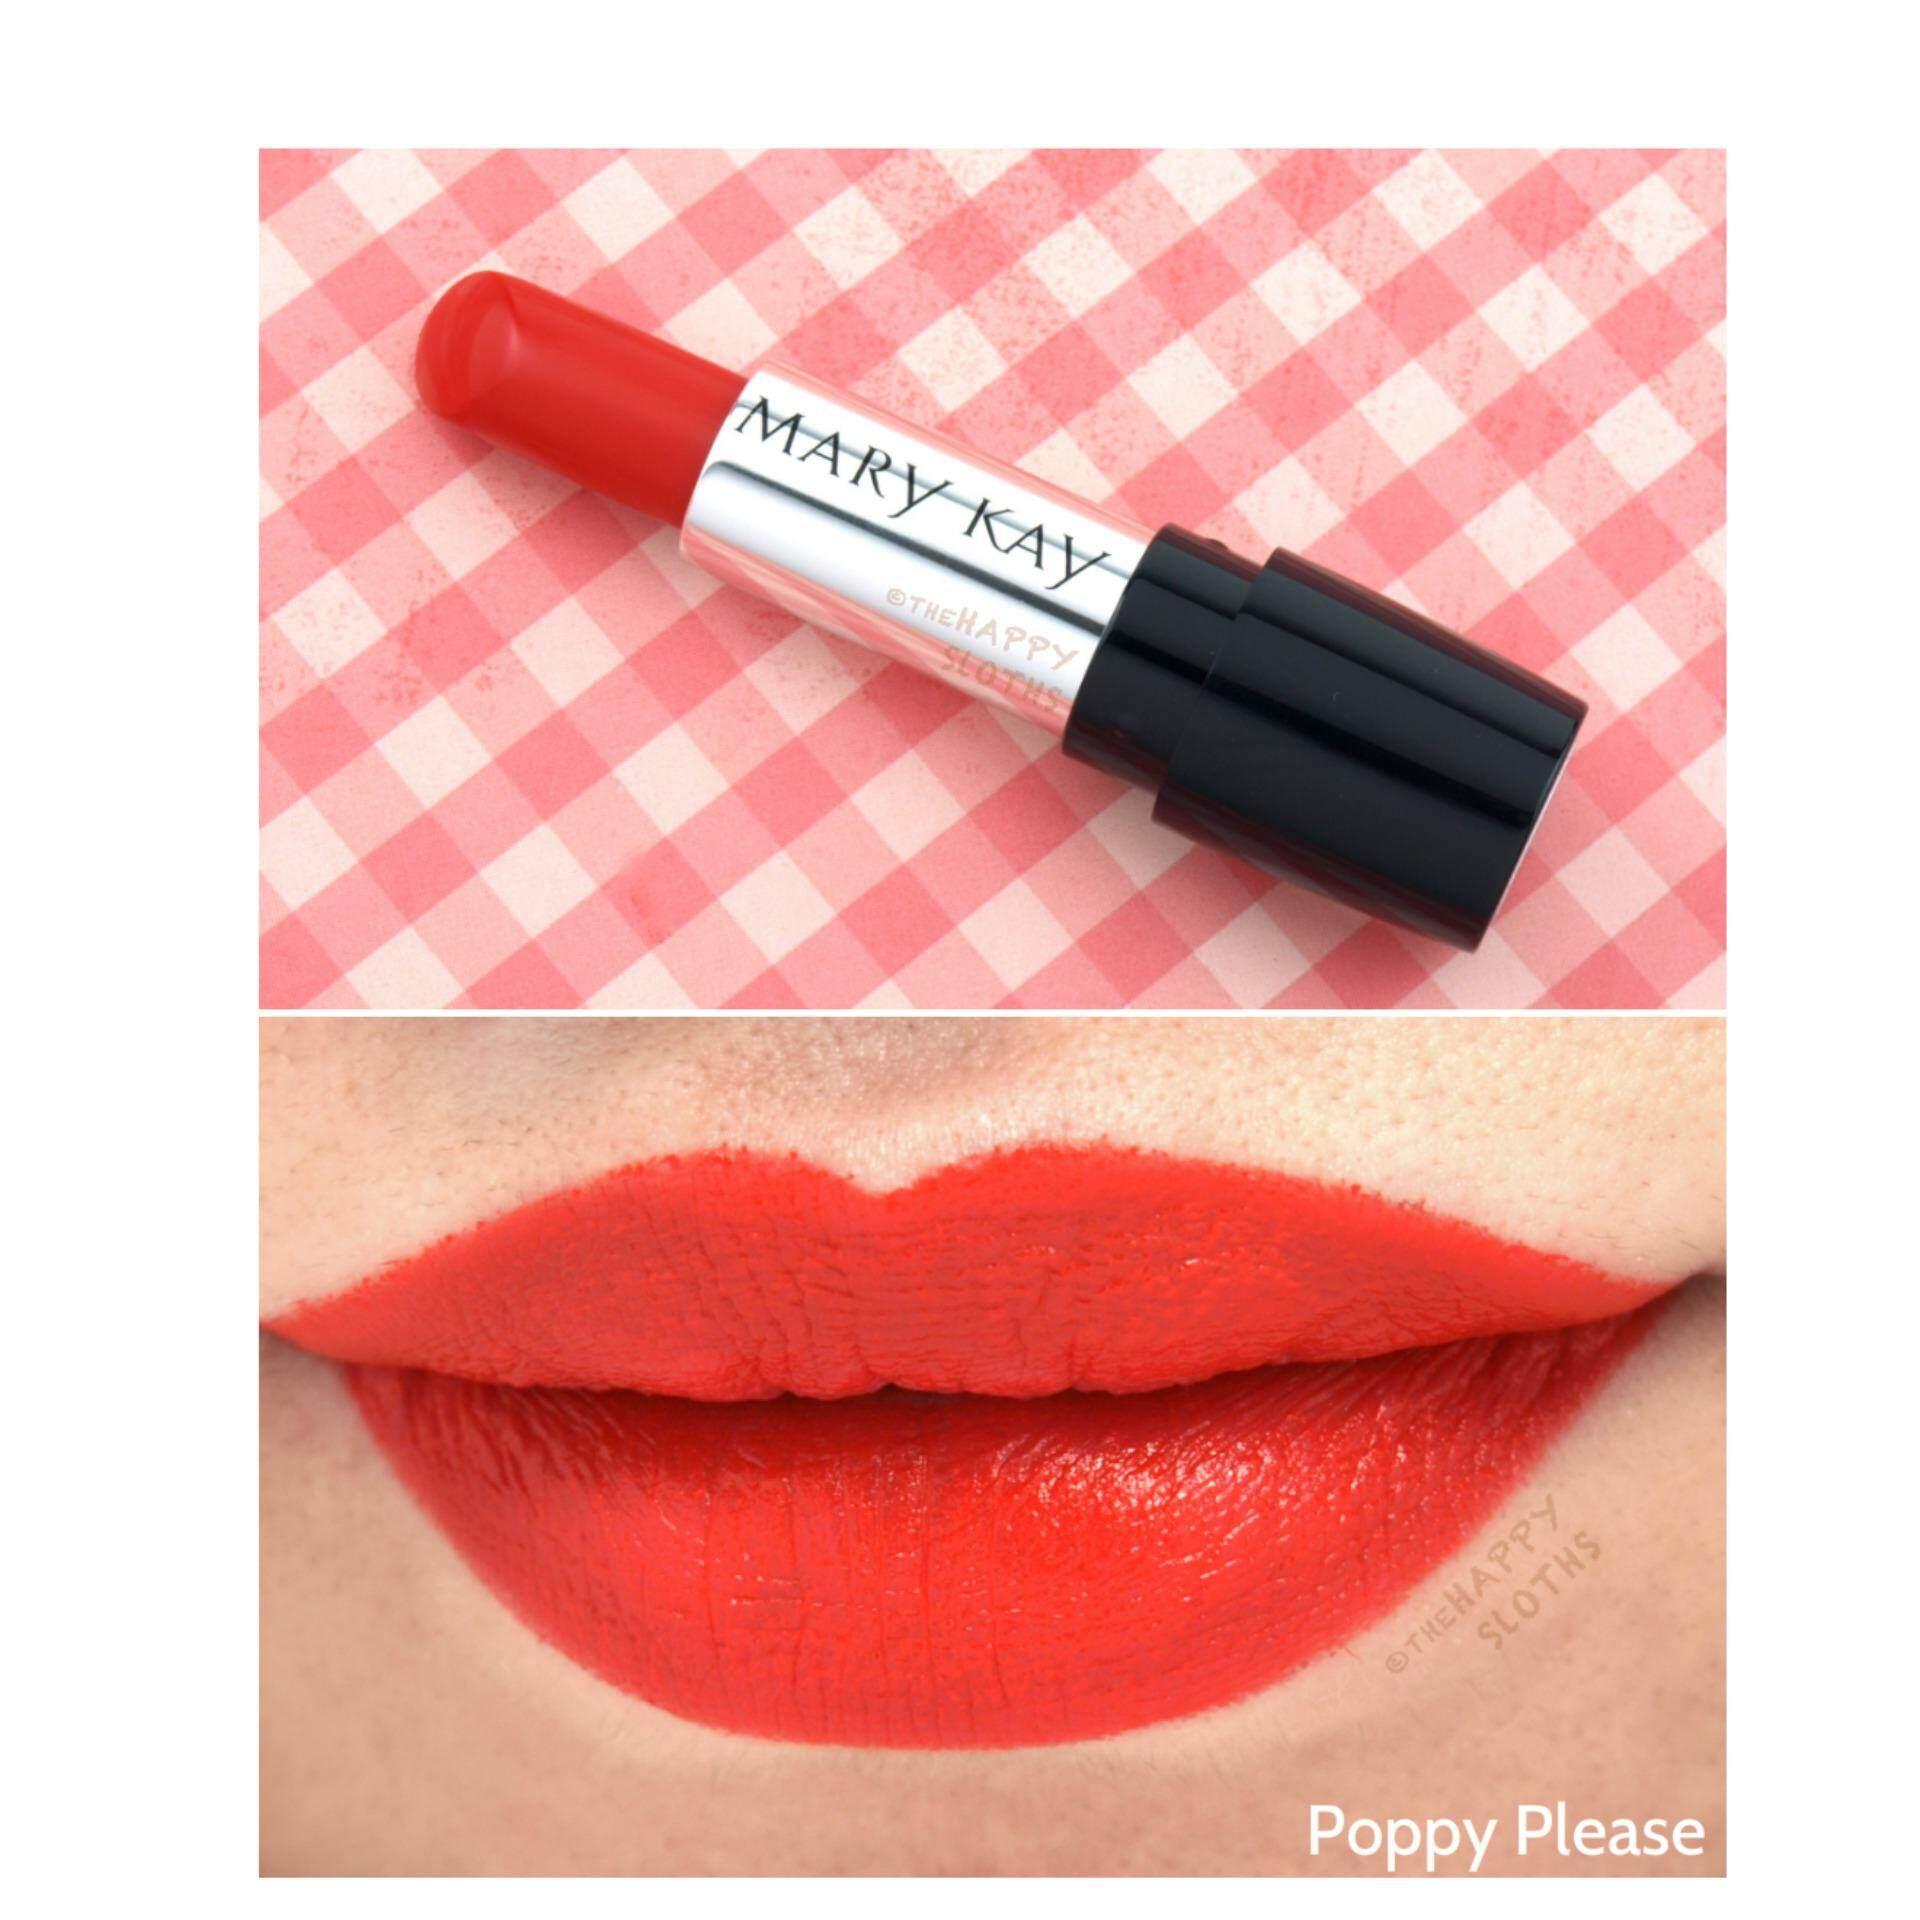 MARY KAY Gel Semi-Matte Lipstick - Poppy Please3.6g lipstick